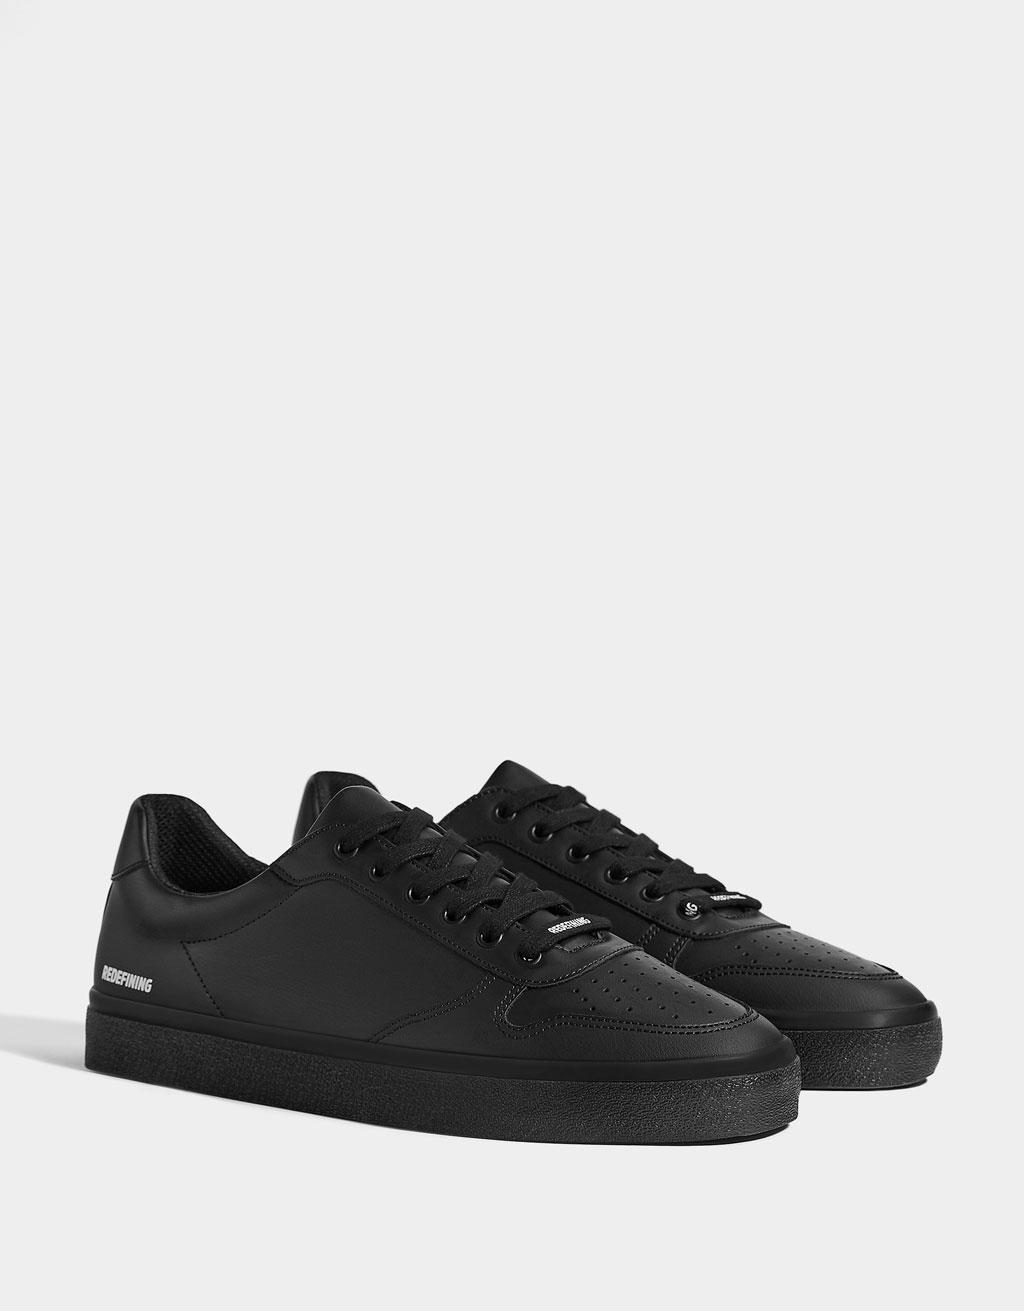 Ensfarvet sort sneaker med budskab herre